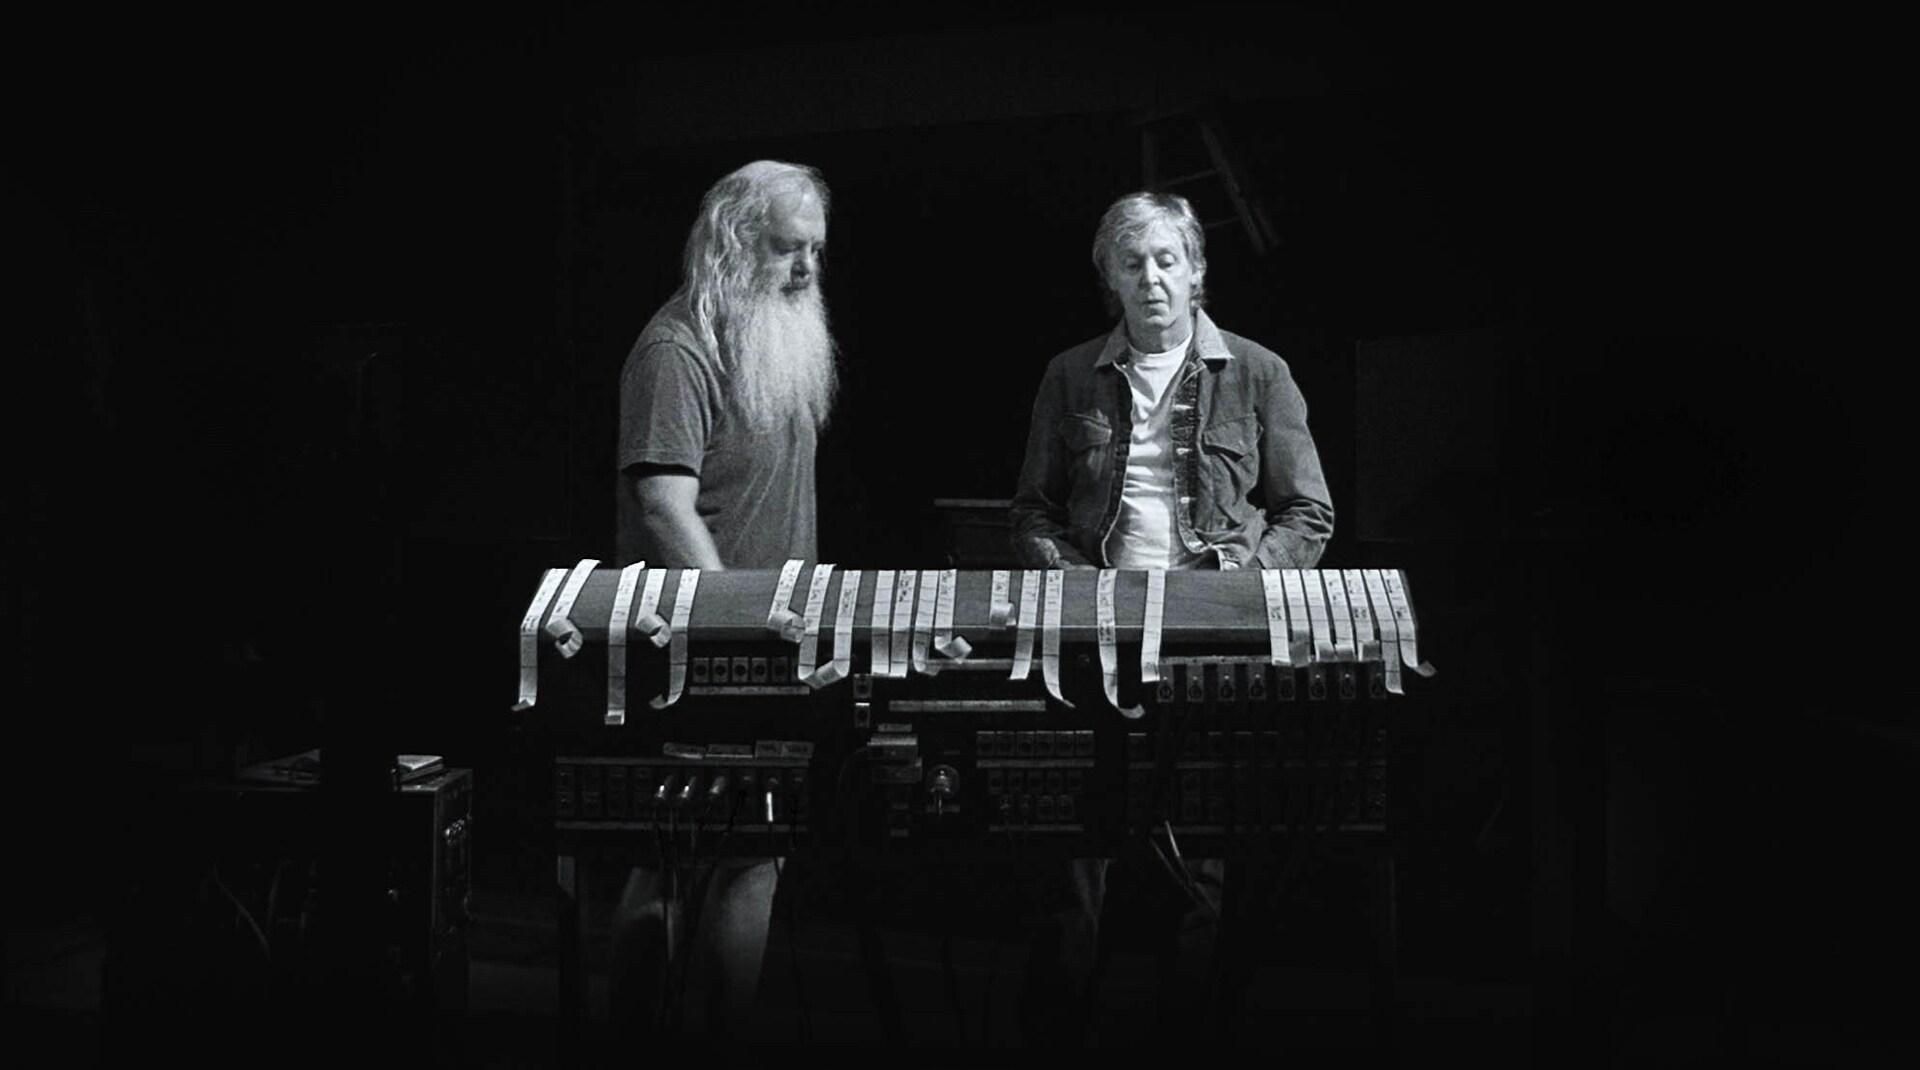 A still image from McCartney 3,2,1